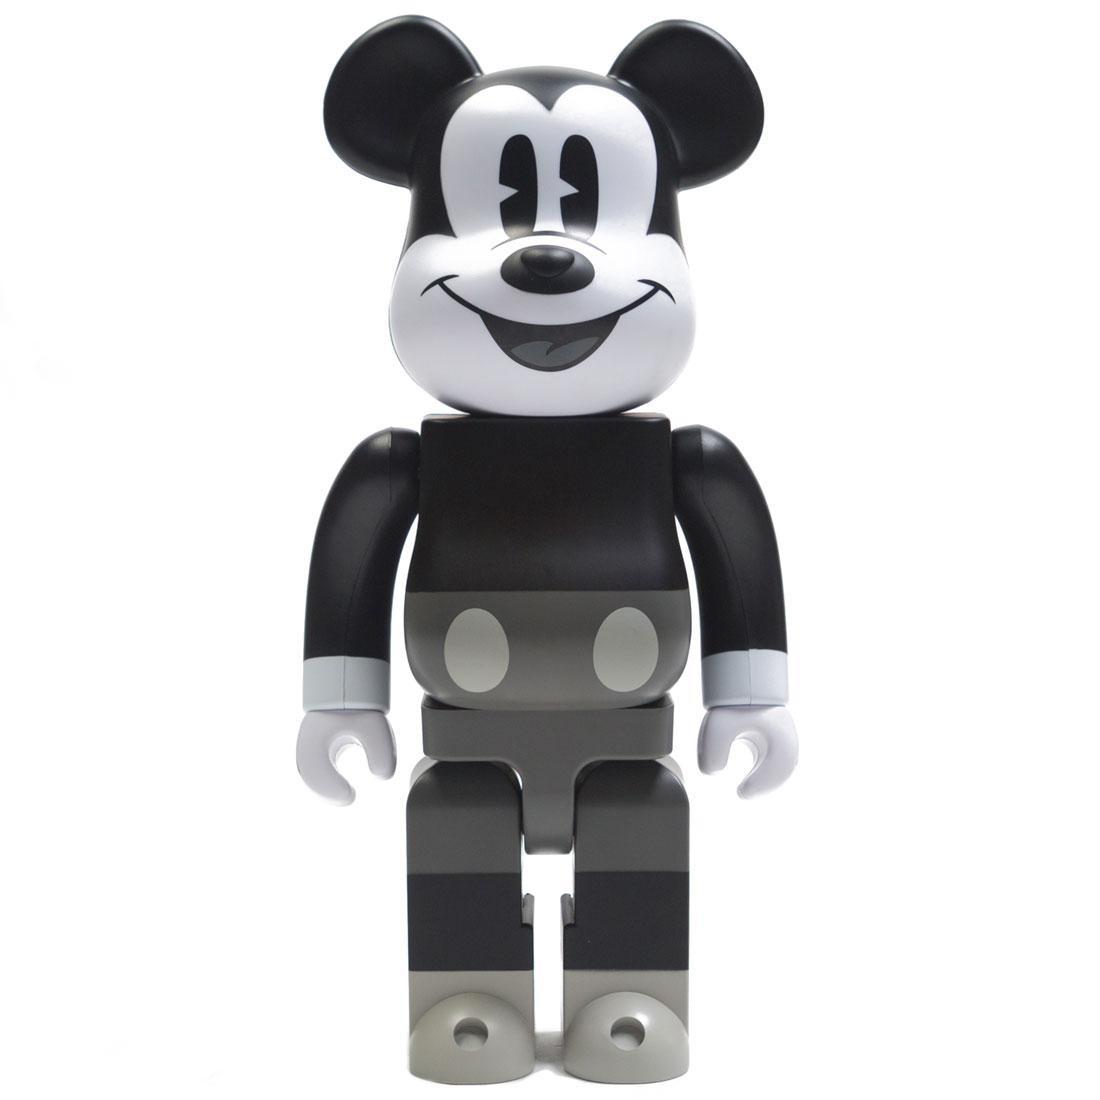 Medicom Disney Mickey Mouse Black And White Ver 400% Bearbrick Figure (black / white)